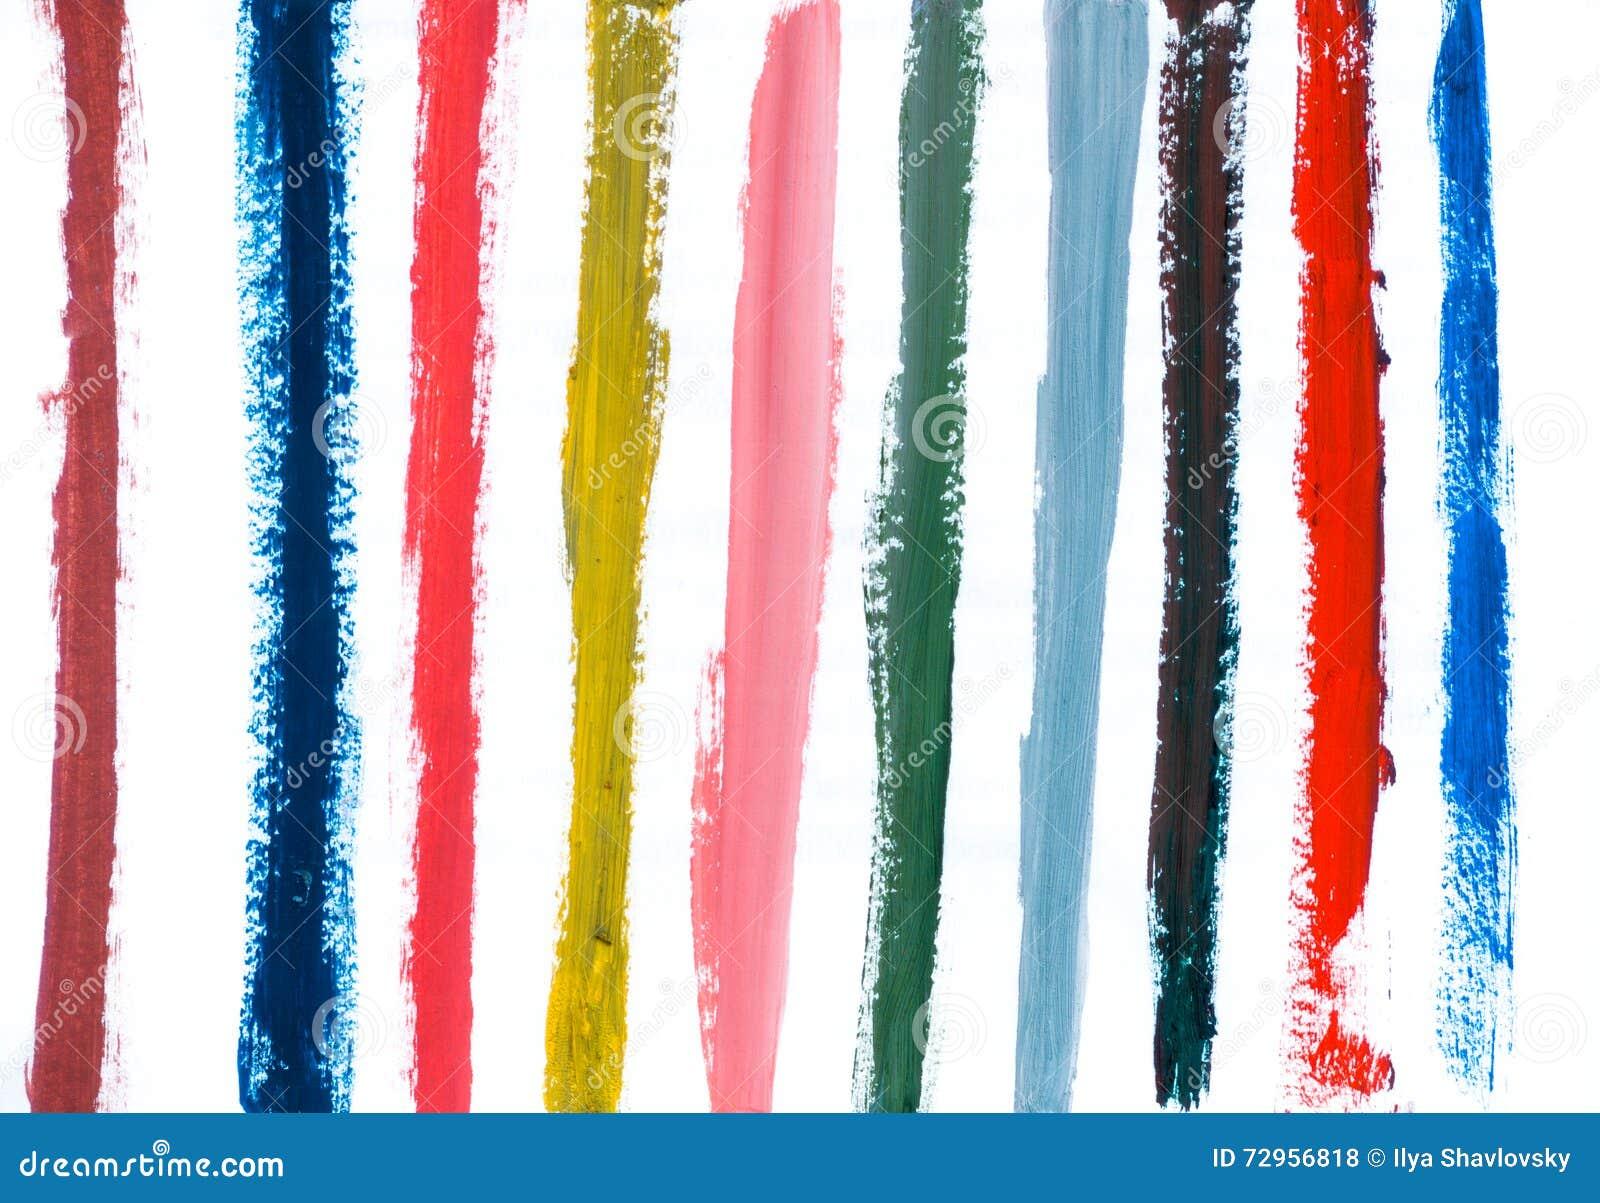 Bande dipinte a mano